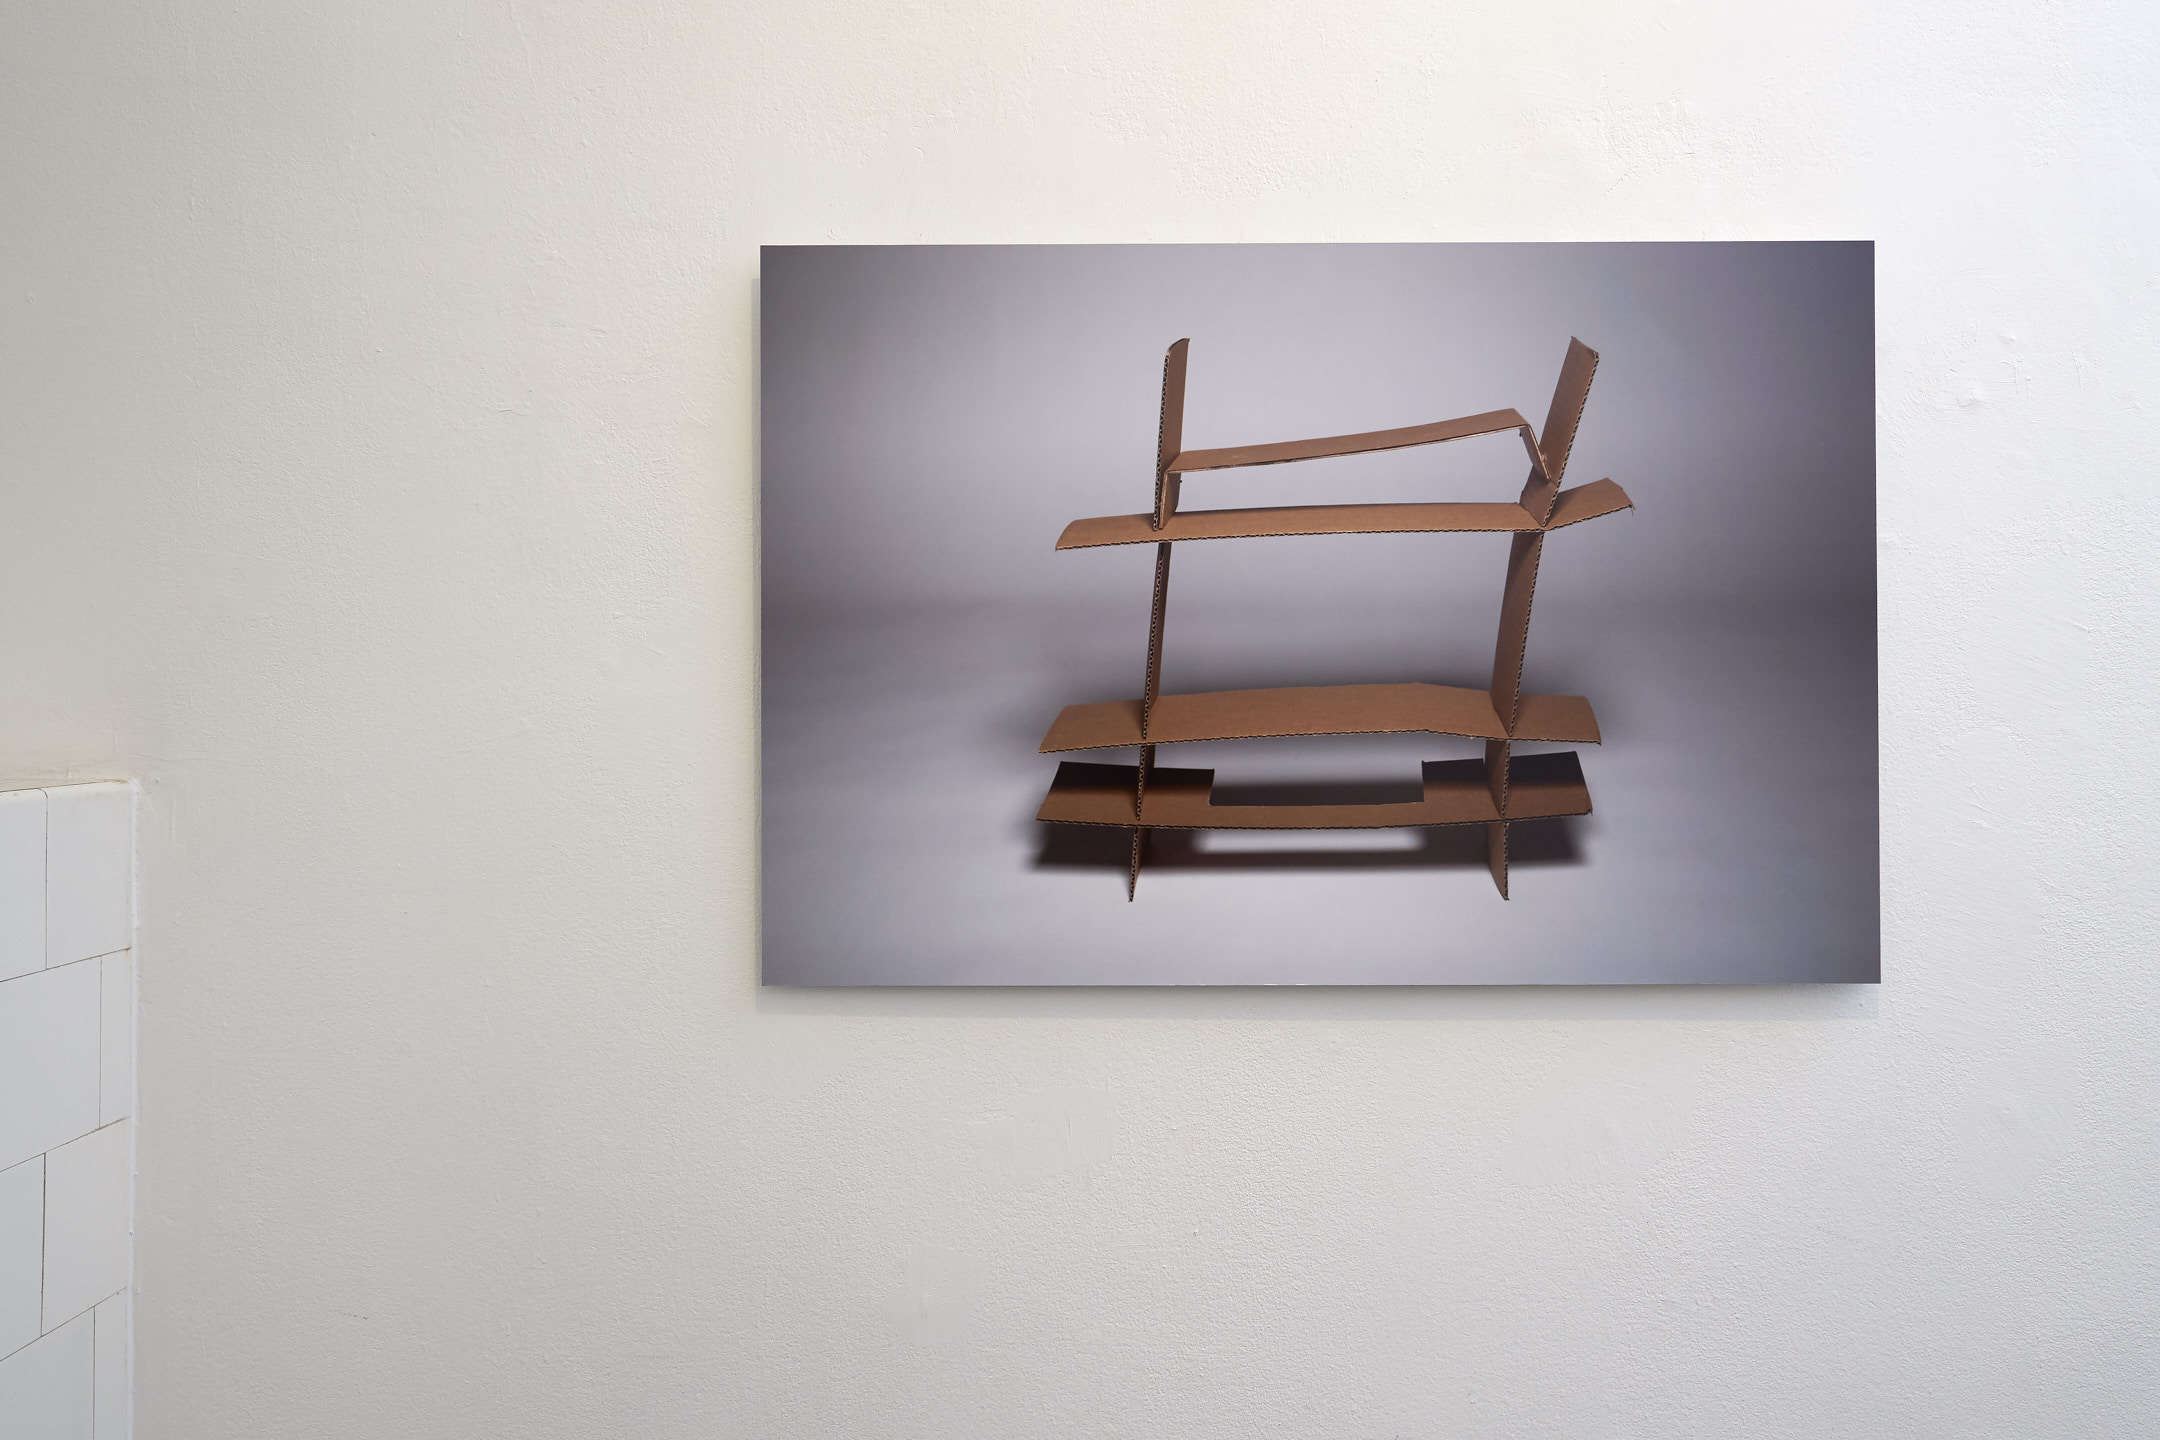 Ausstellung CHRISTINA TSILIDIS, Galerie Marenzi